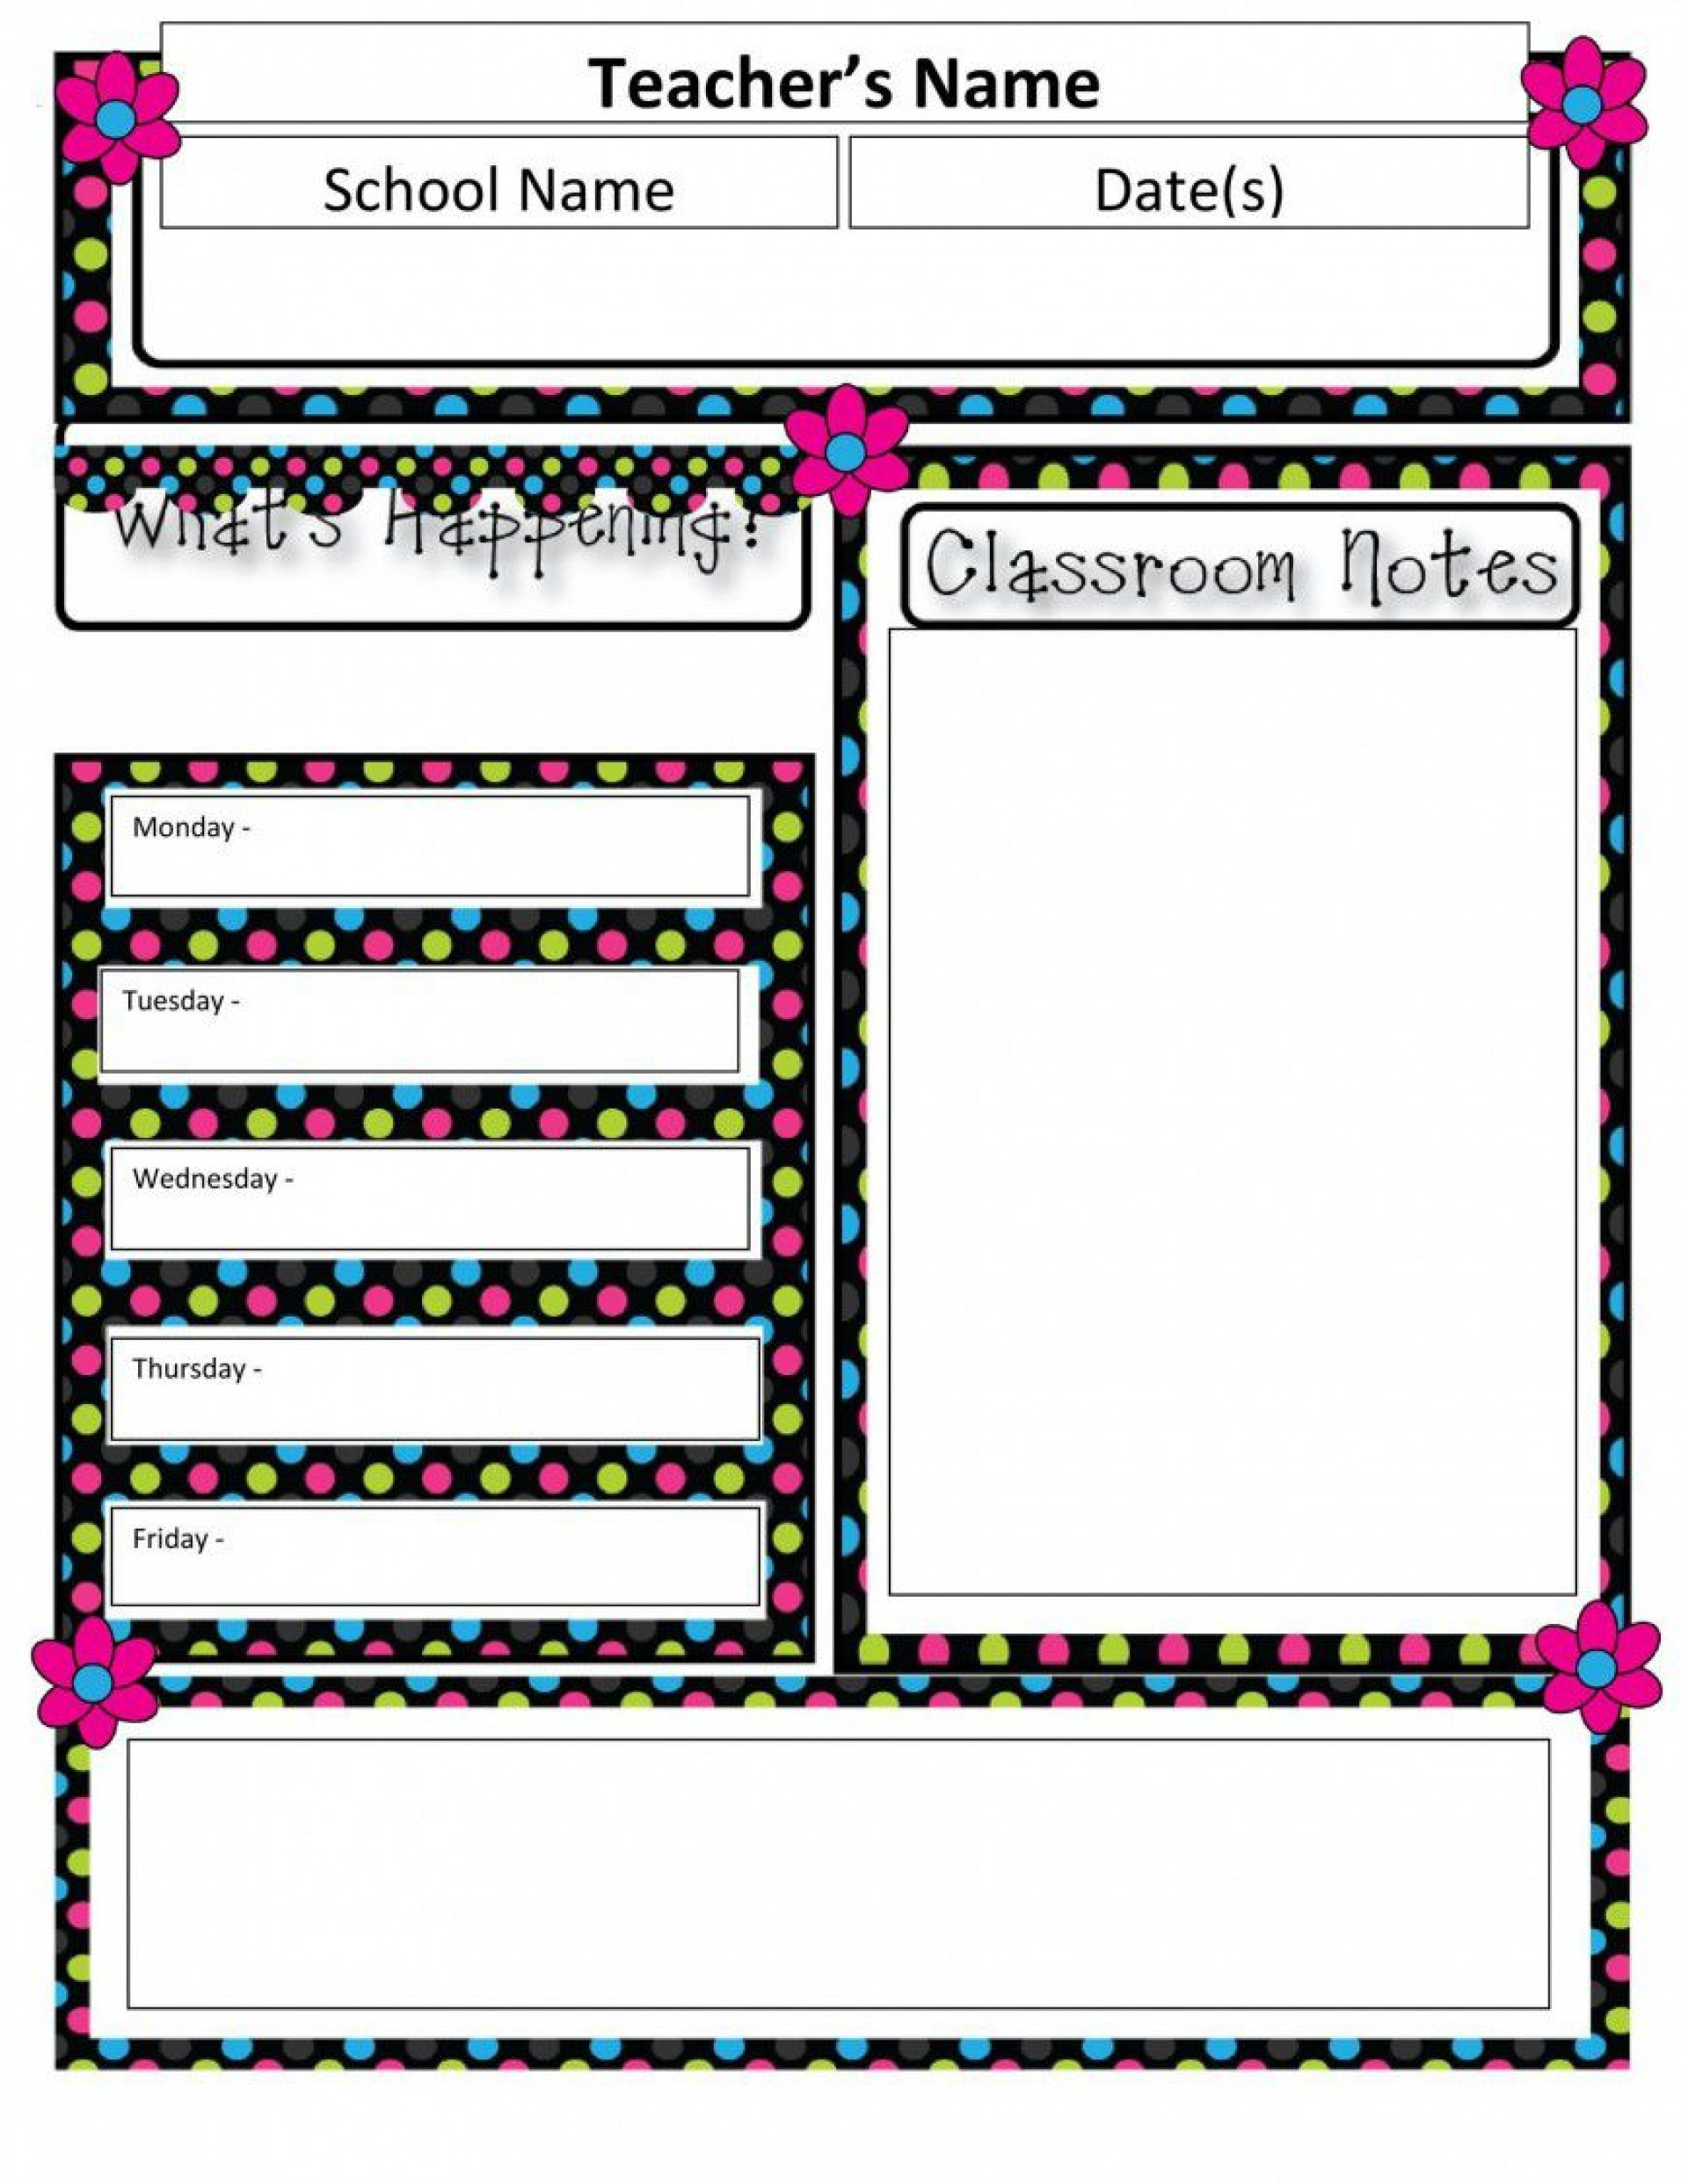 000 Impressive Elementary School Newsletter Template Design  Clas Teacher Free Counselor1920